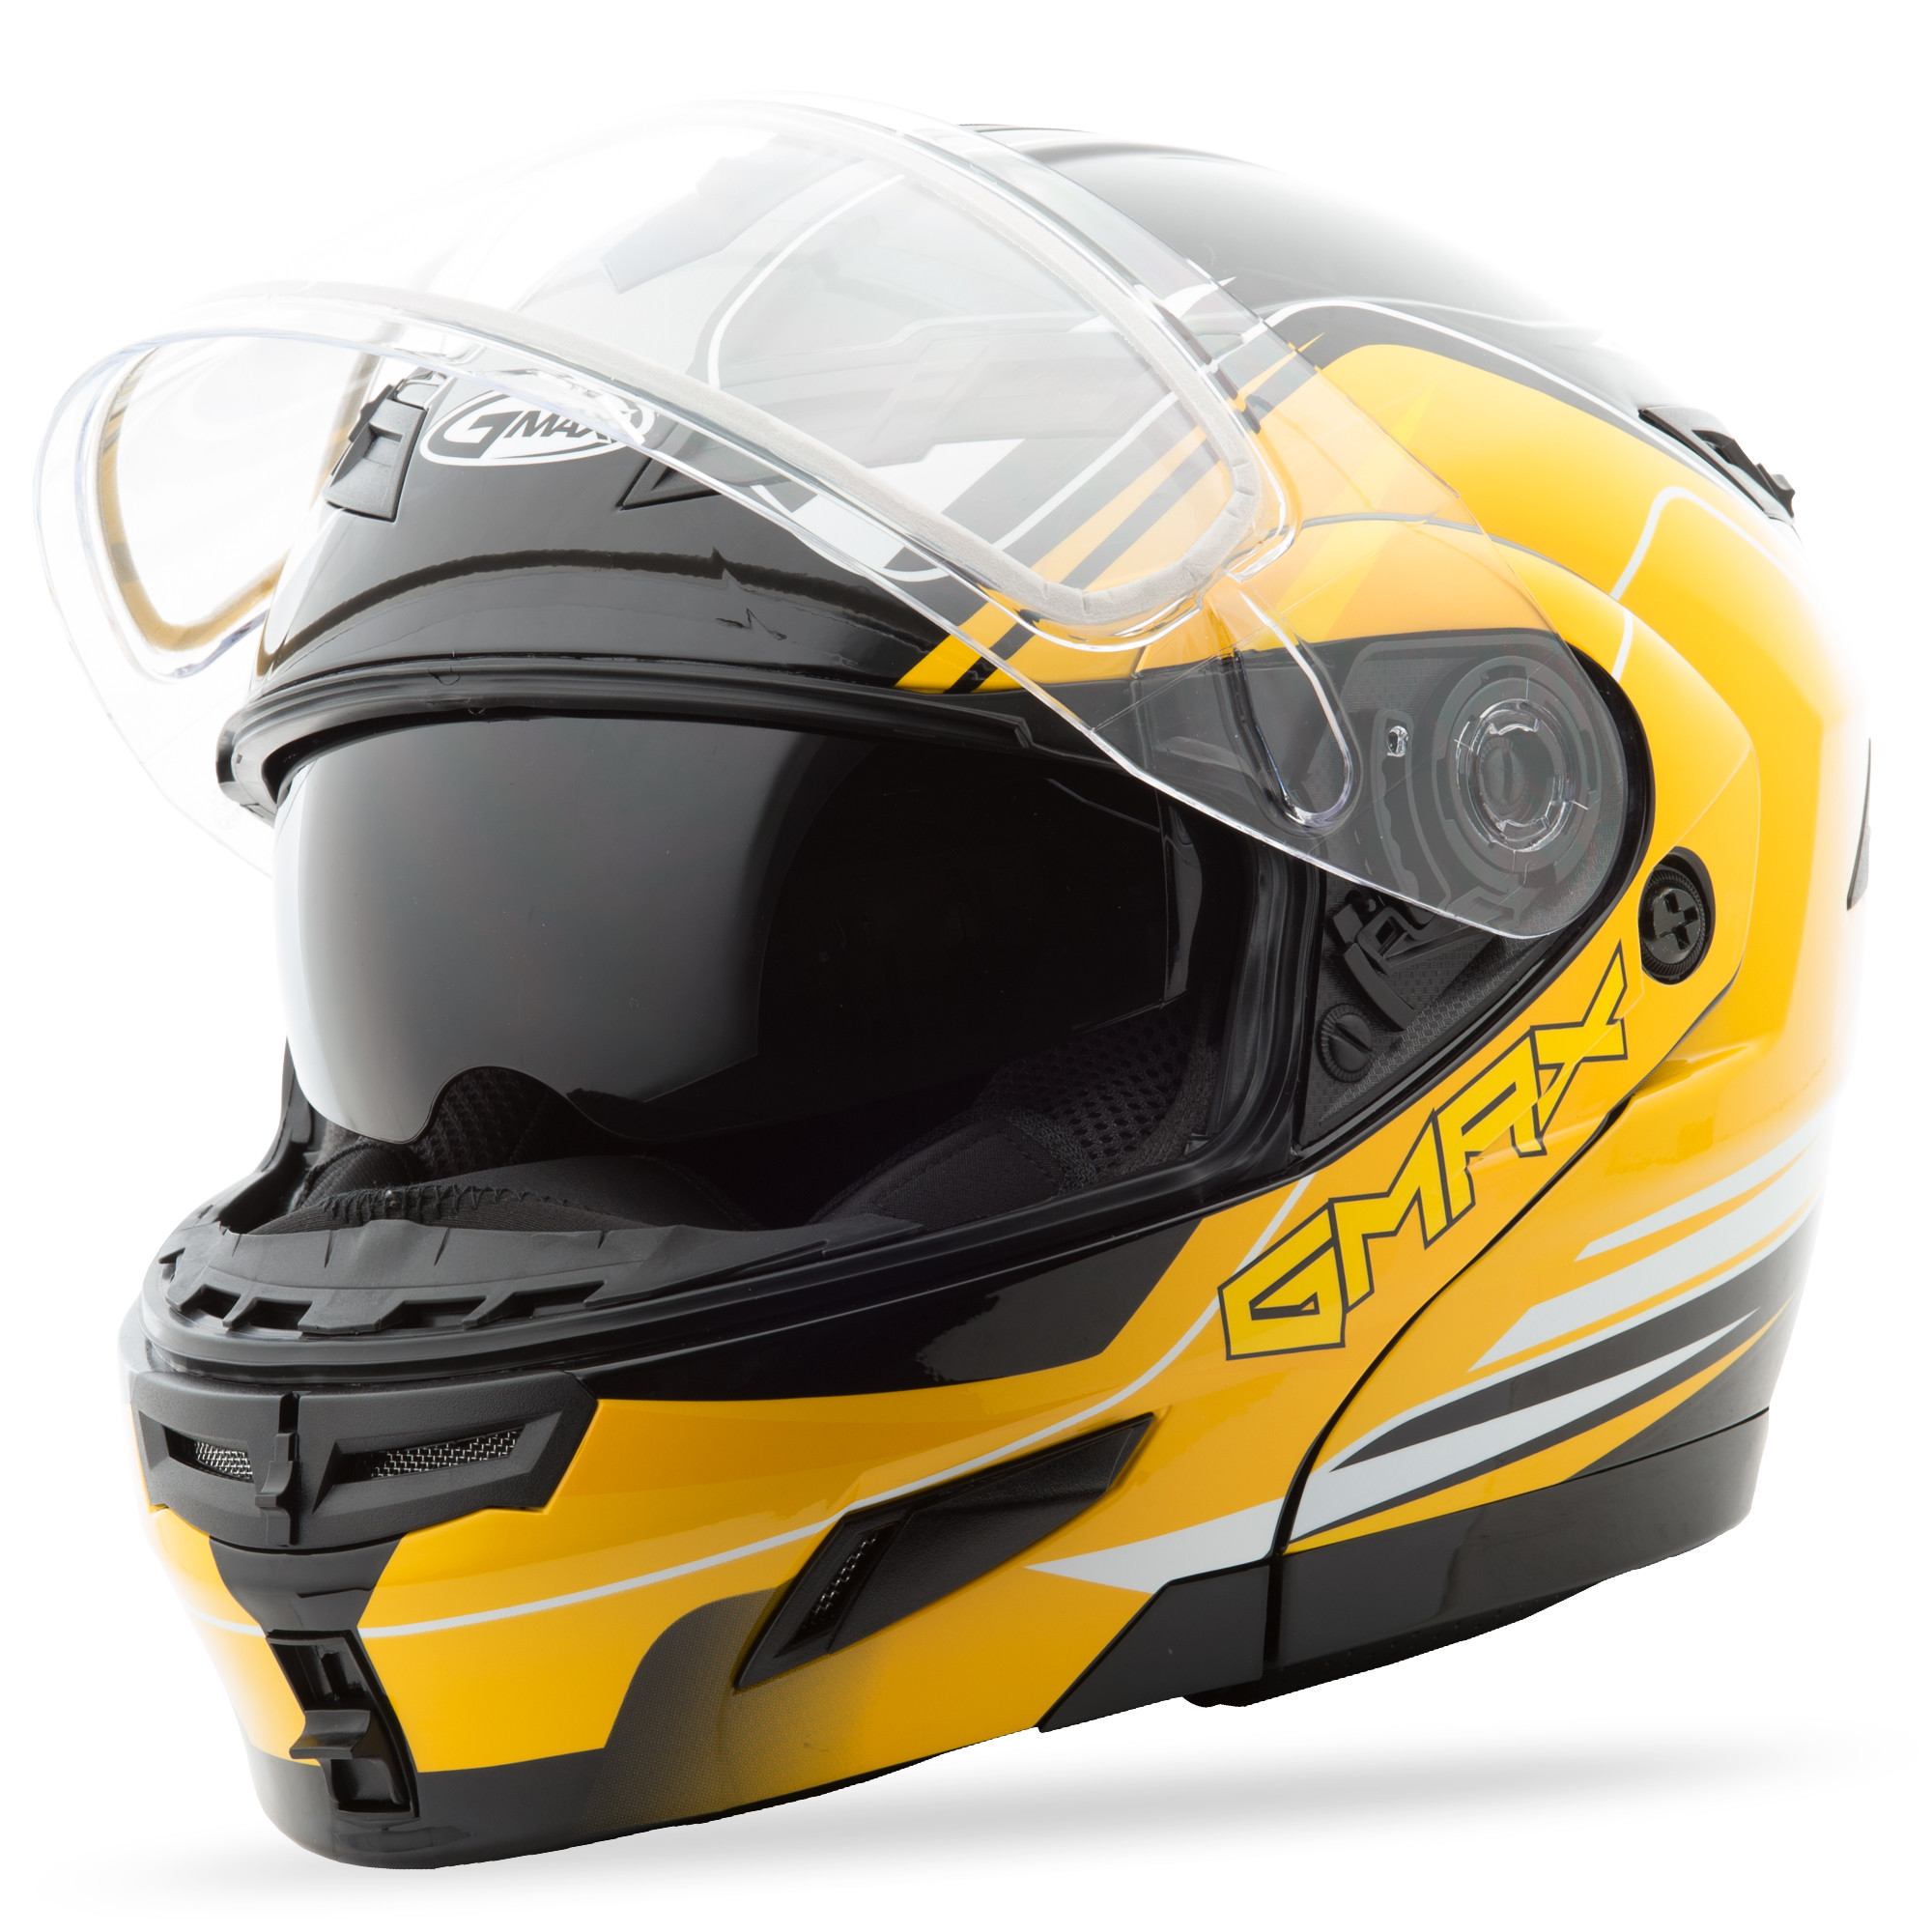 G-Max GM54S Terrain Snow Helmet by G-Max